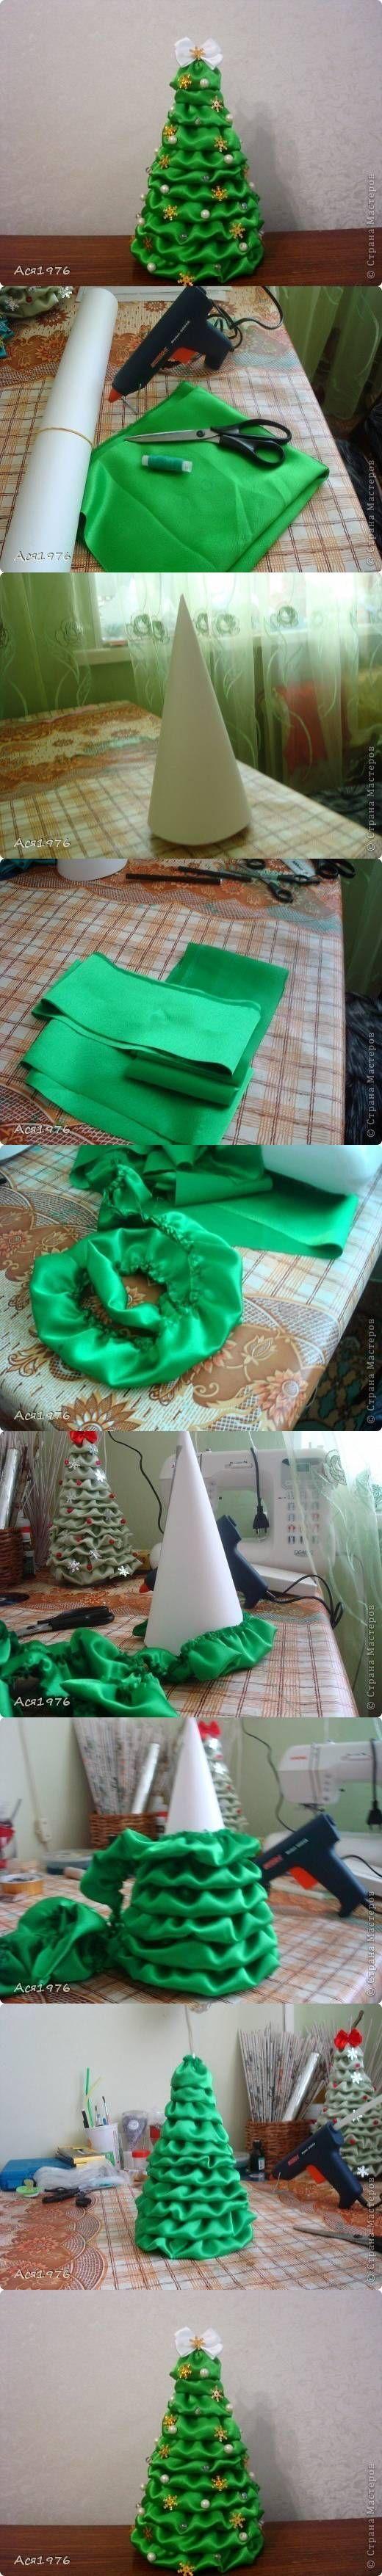 DIY Fabric Christmas Tree DIY Projects | UsefulDIY.com Follow Us on Facebook ==> http://www ...